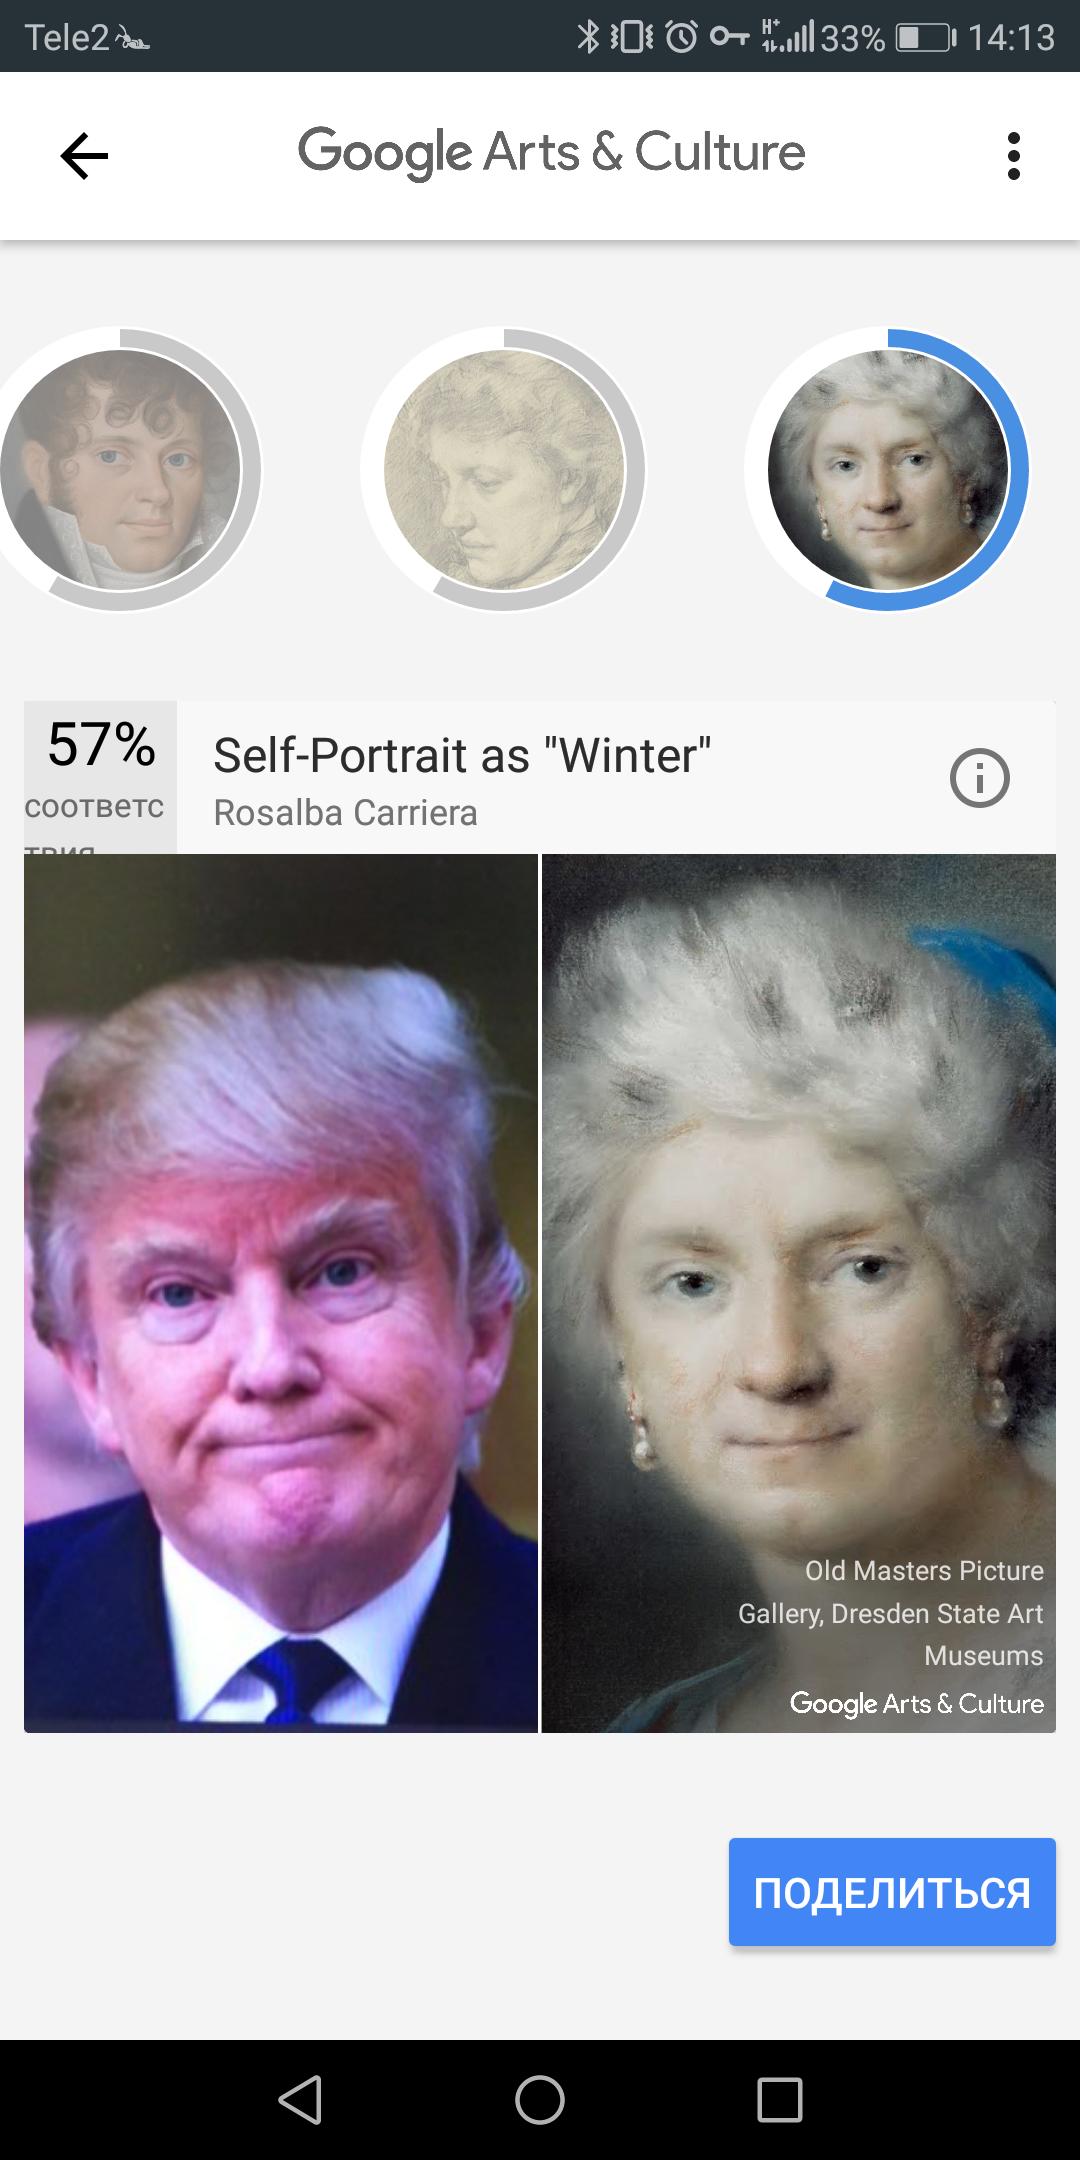 гугл сходство фото обладательниц коротких